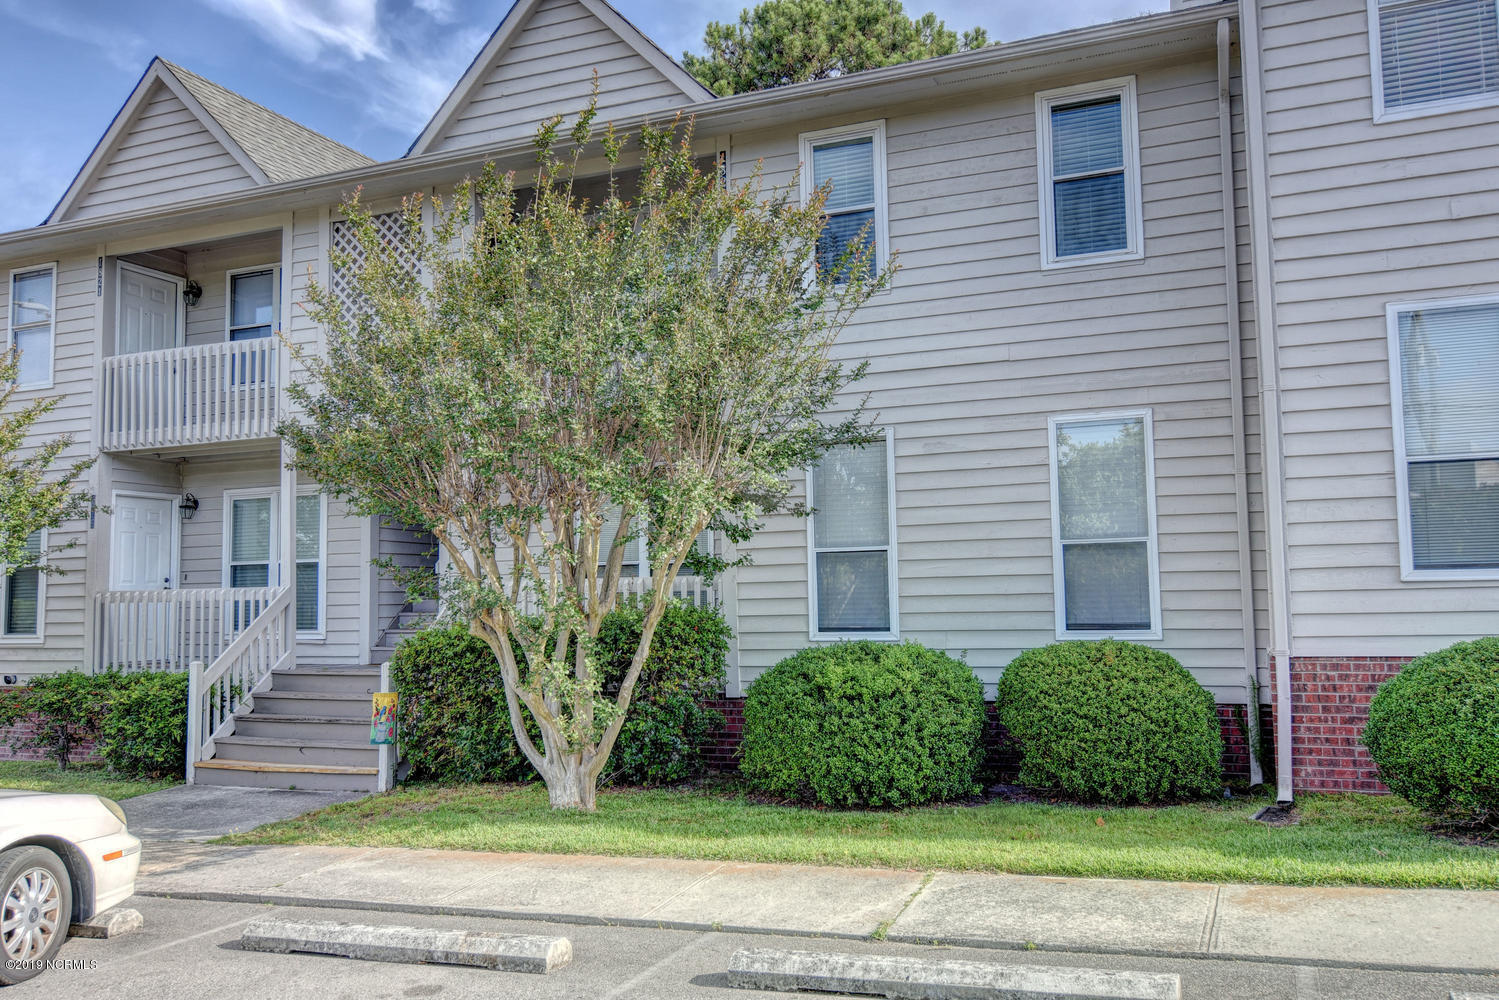 Carolina Plantations Real Estate - MLS Number: 100154806